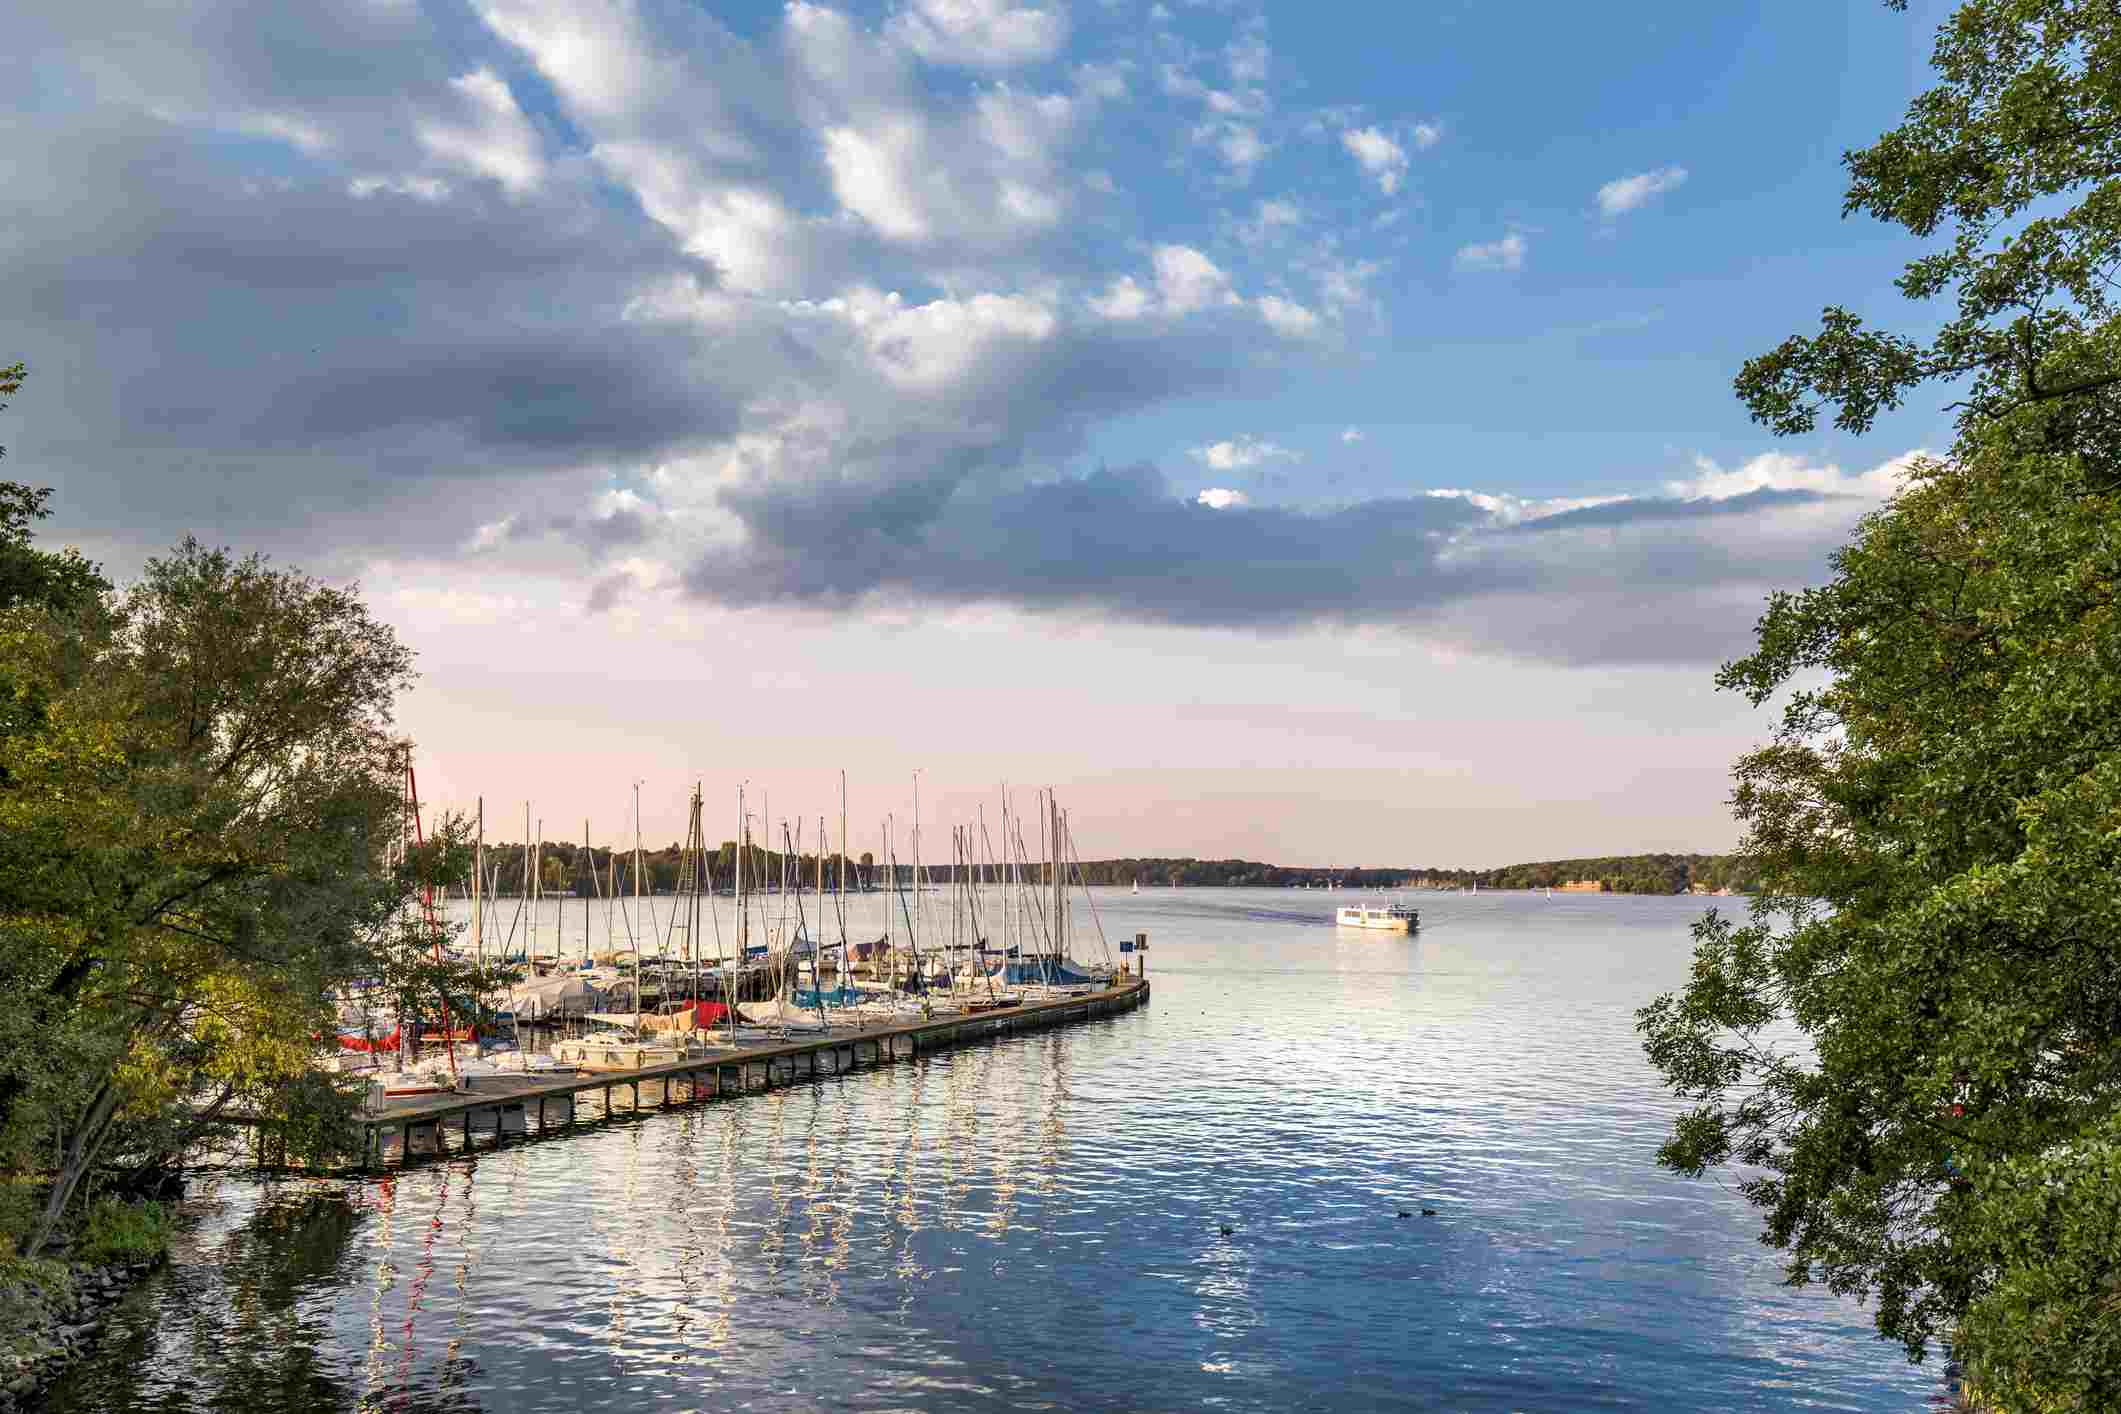 Lake Wannsee